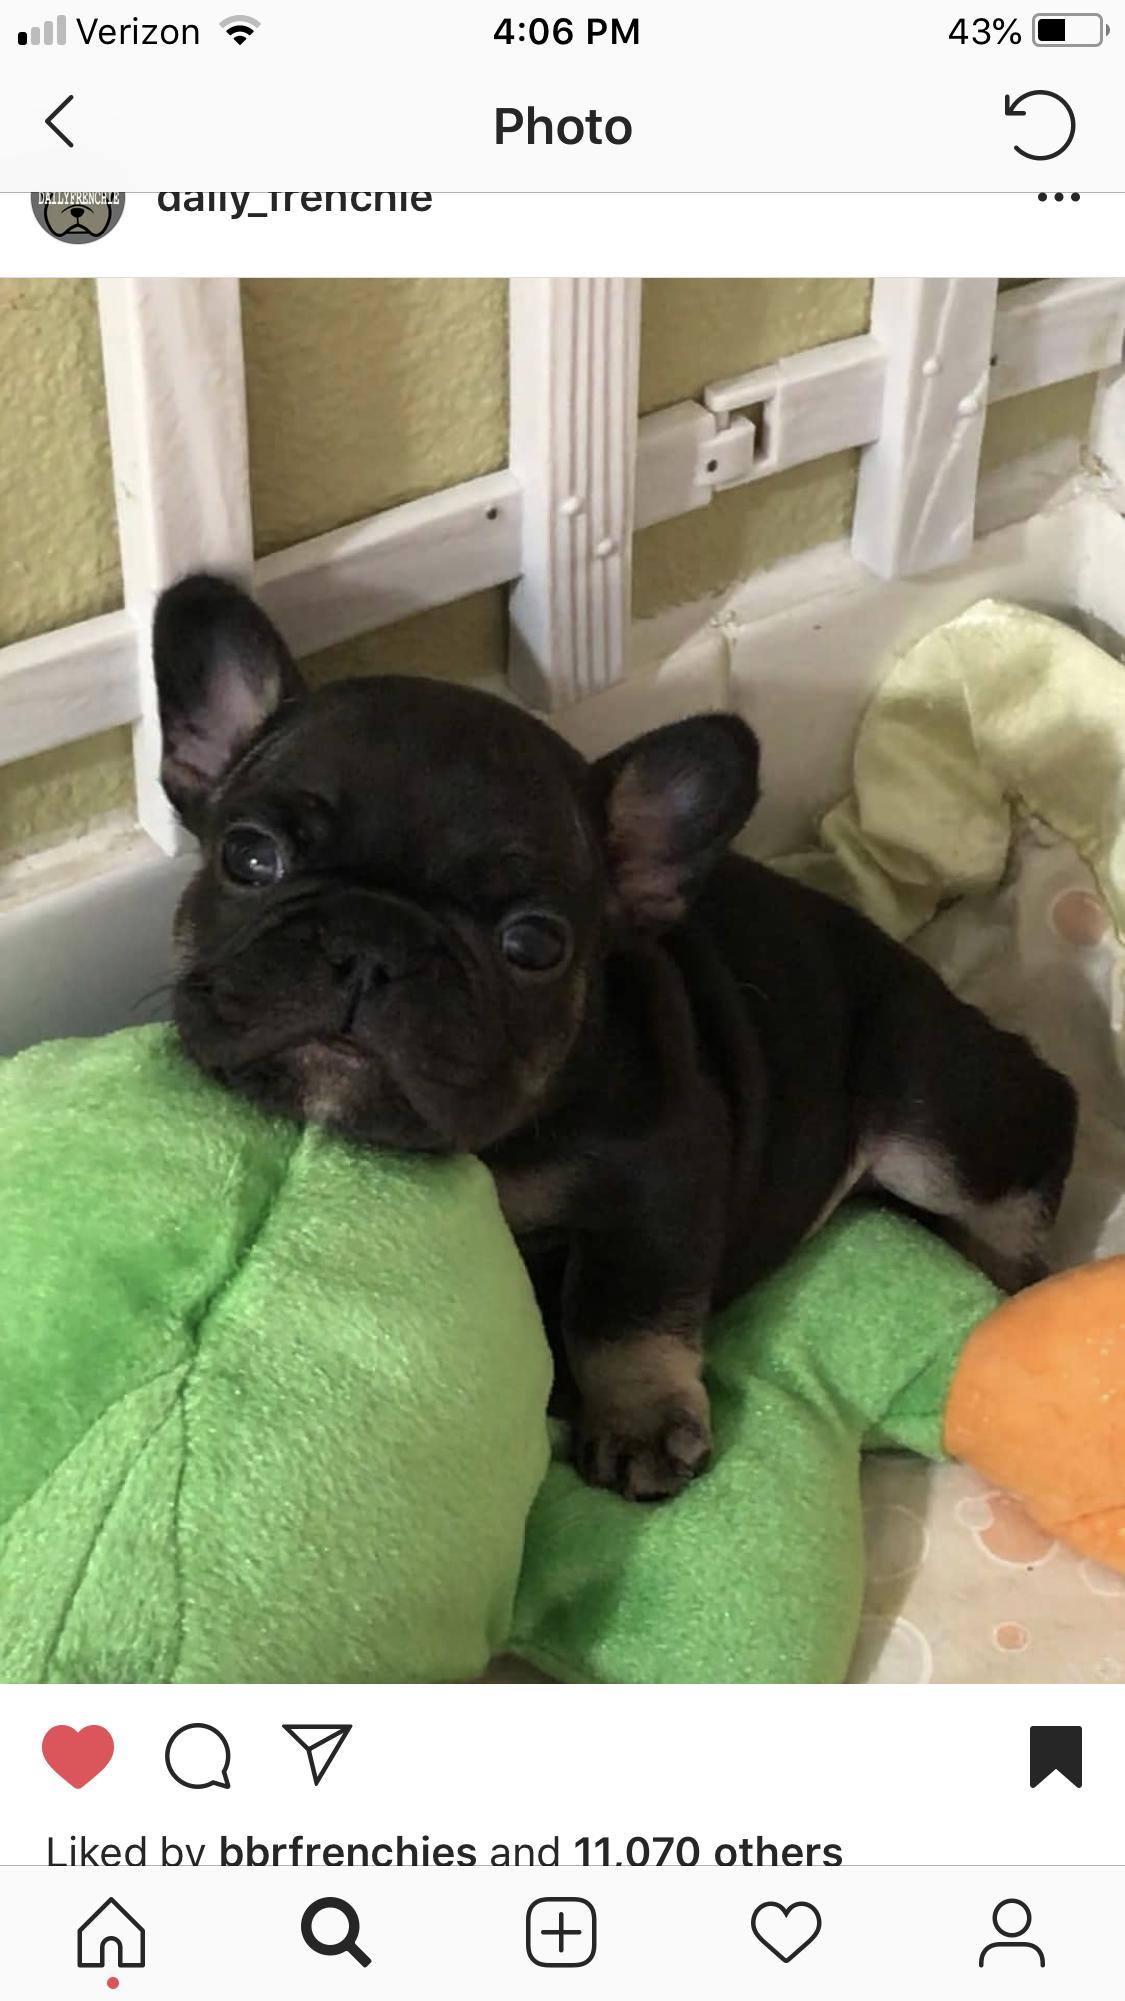 Dogs Of Instagram Lnstadogclub Instagram Posts Videos Stories